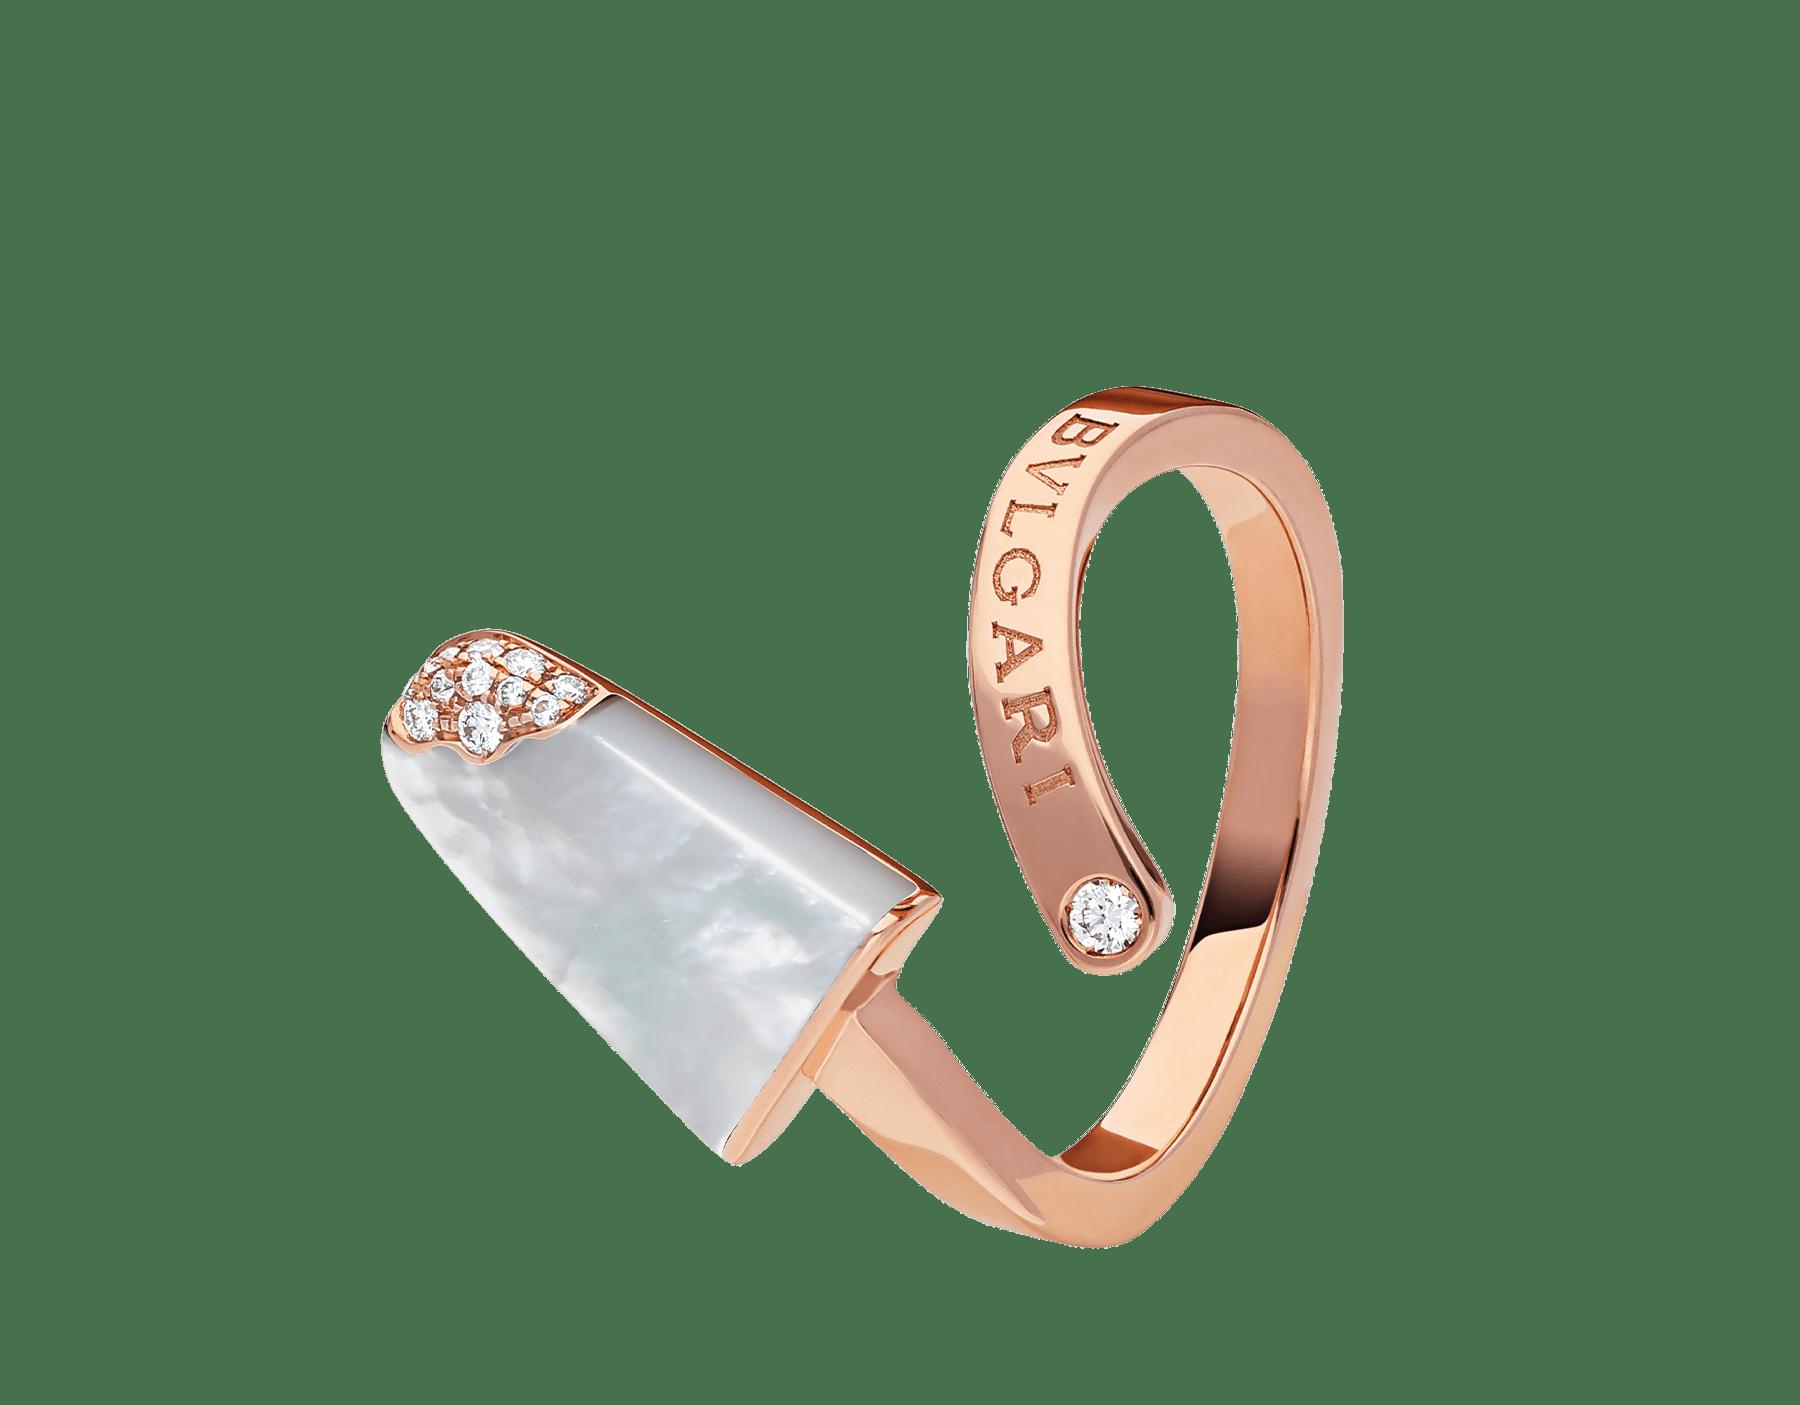 Bague BVLGARI BVLGARI Gelati en or rose 18K avec nacre et pavé diamants AN858014 image 2